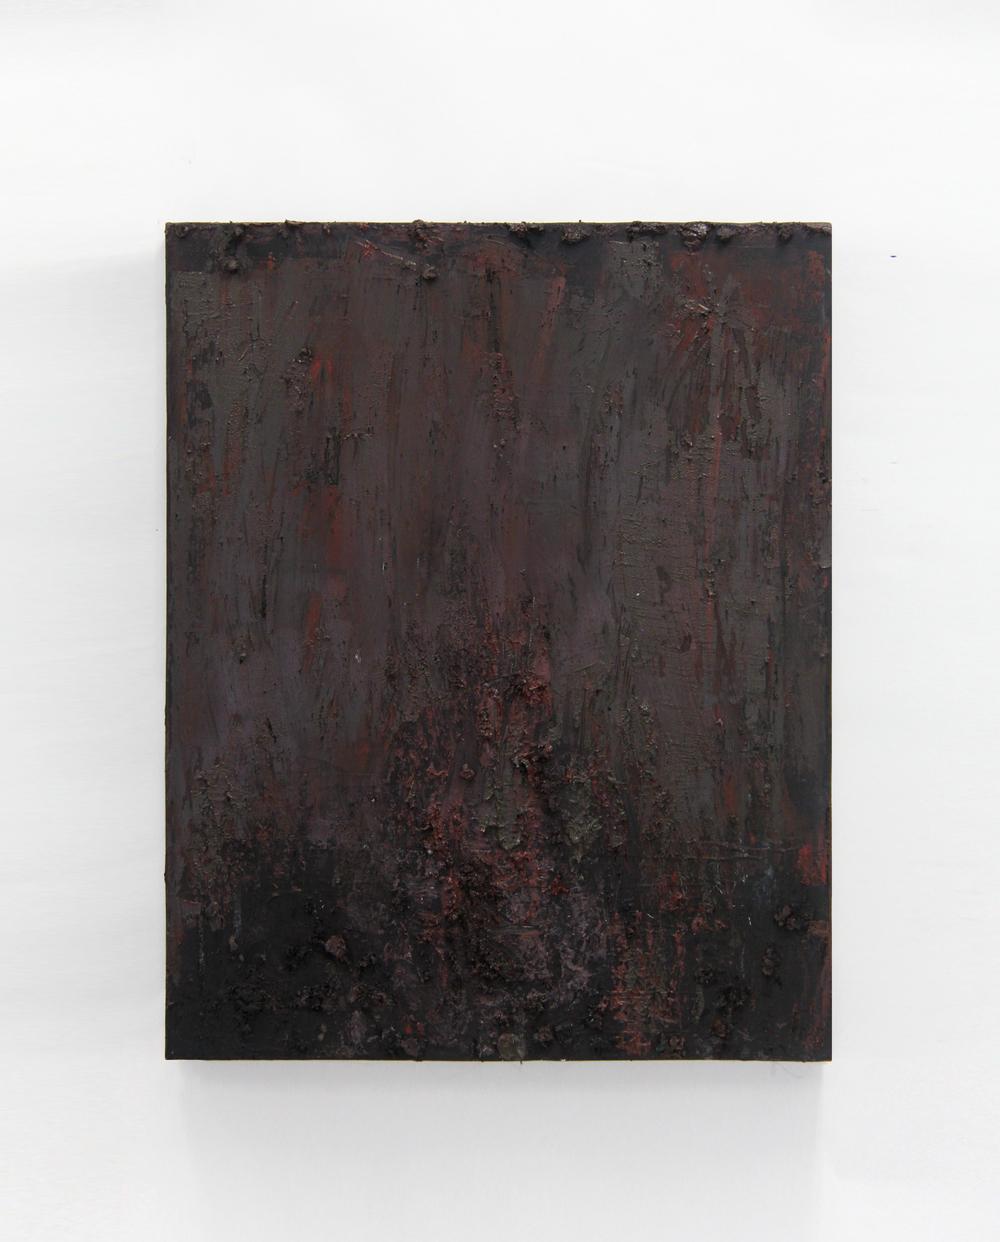 Junior_Paintings_Fall_Finals_4_2.jpg